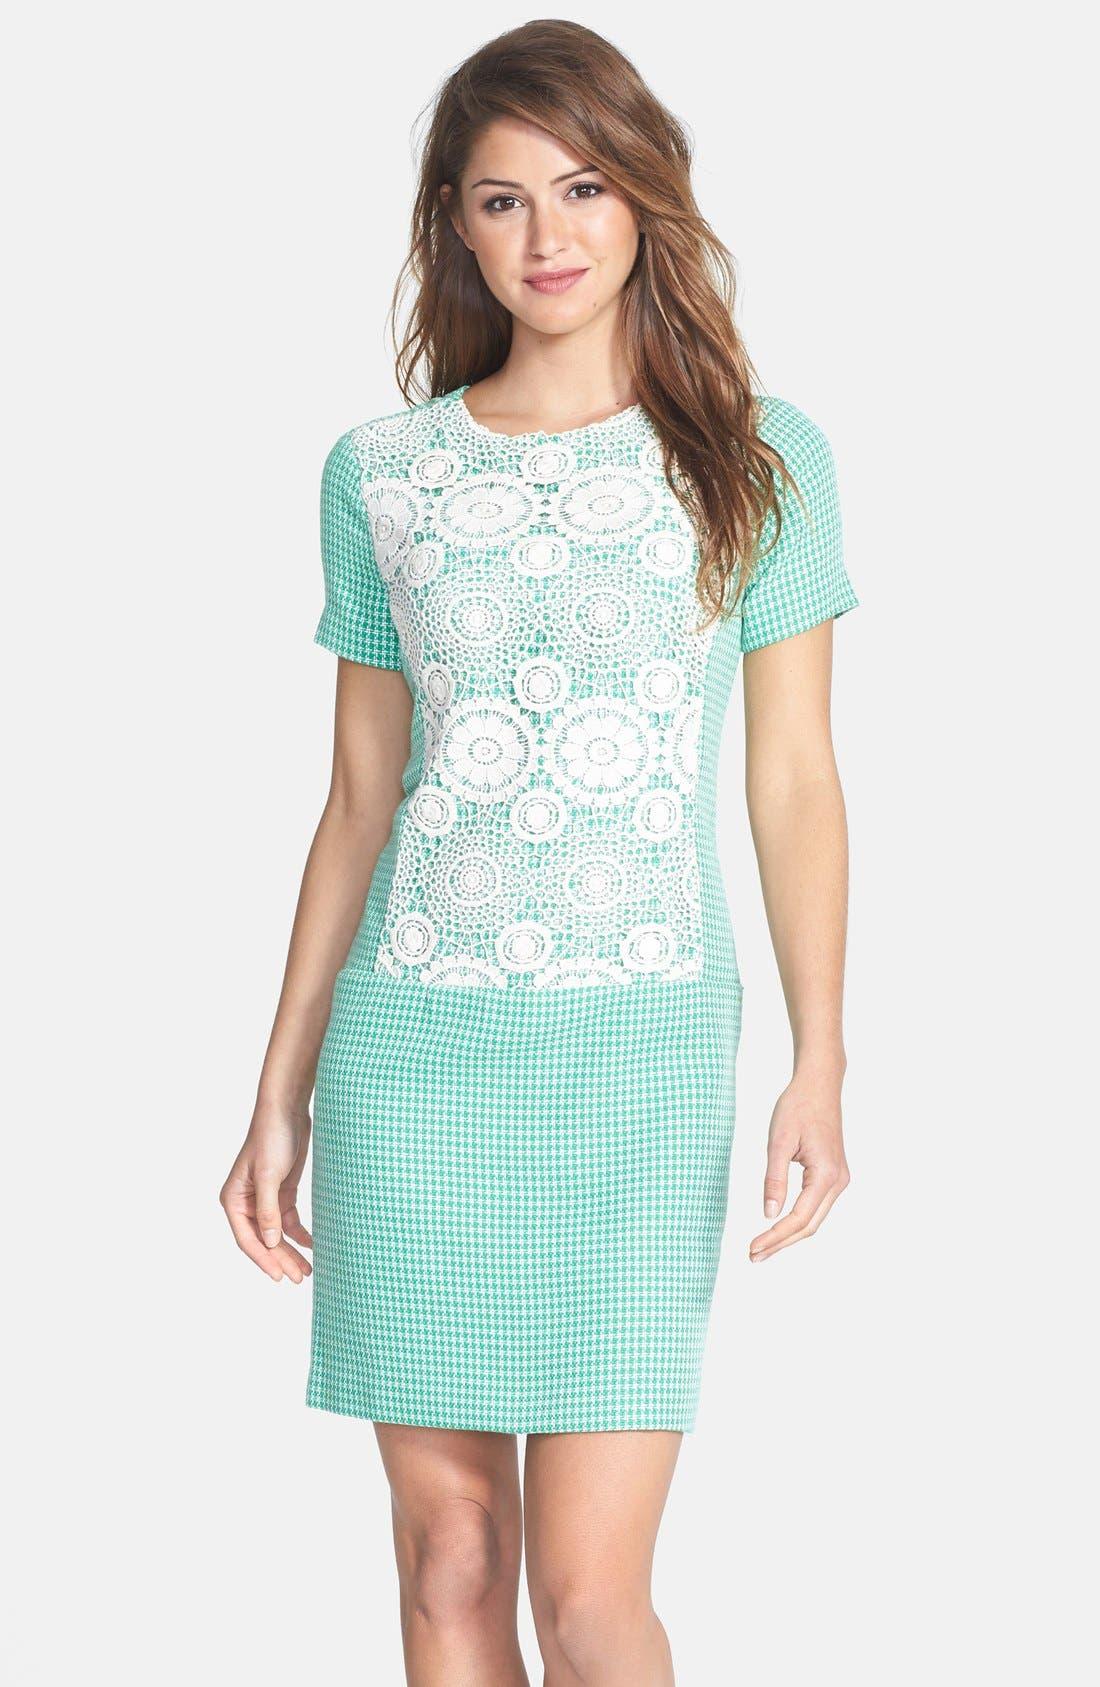 Alternate Image 1 Selected - Ivy & Blu Crochet Panel Tweed Shift Dress